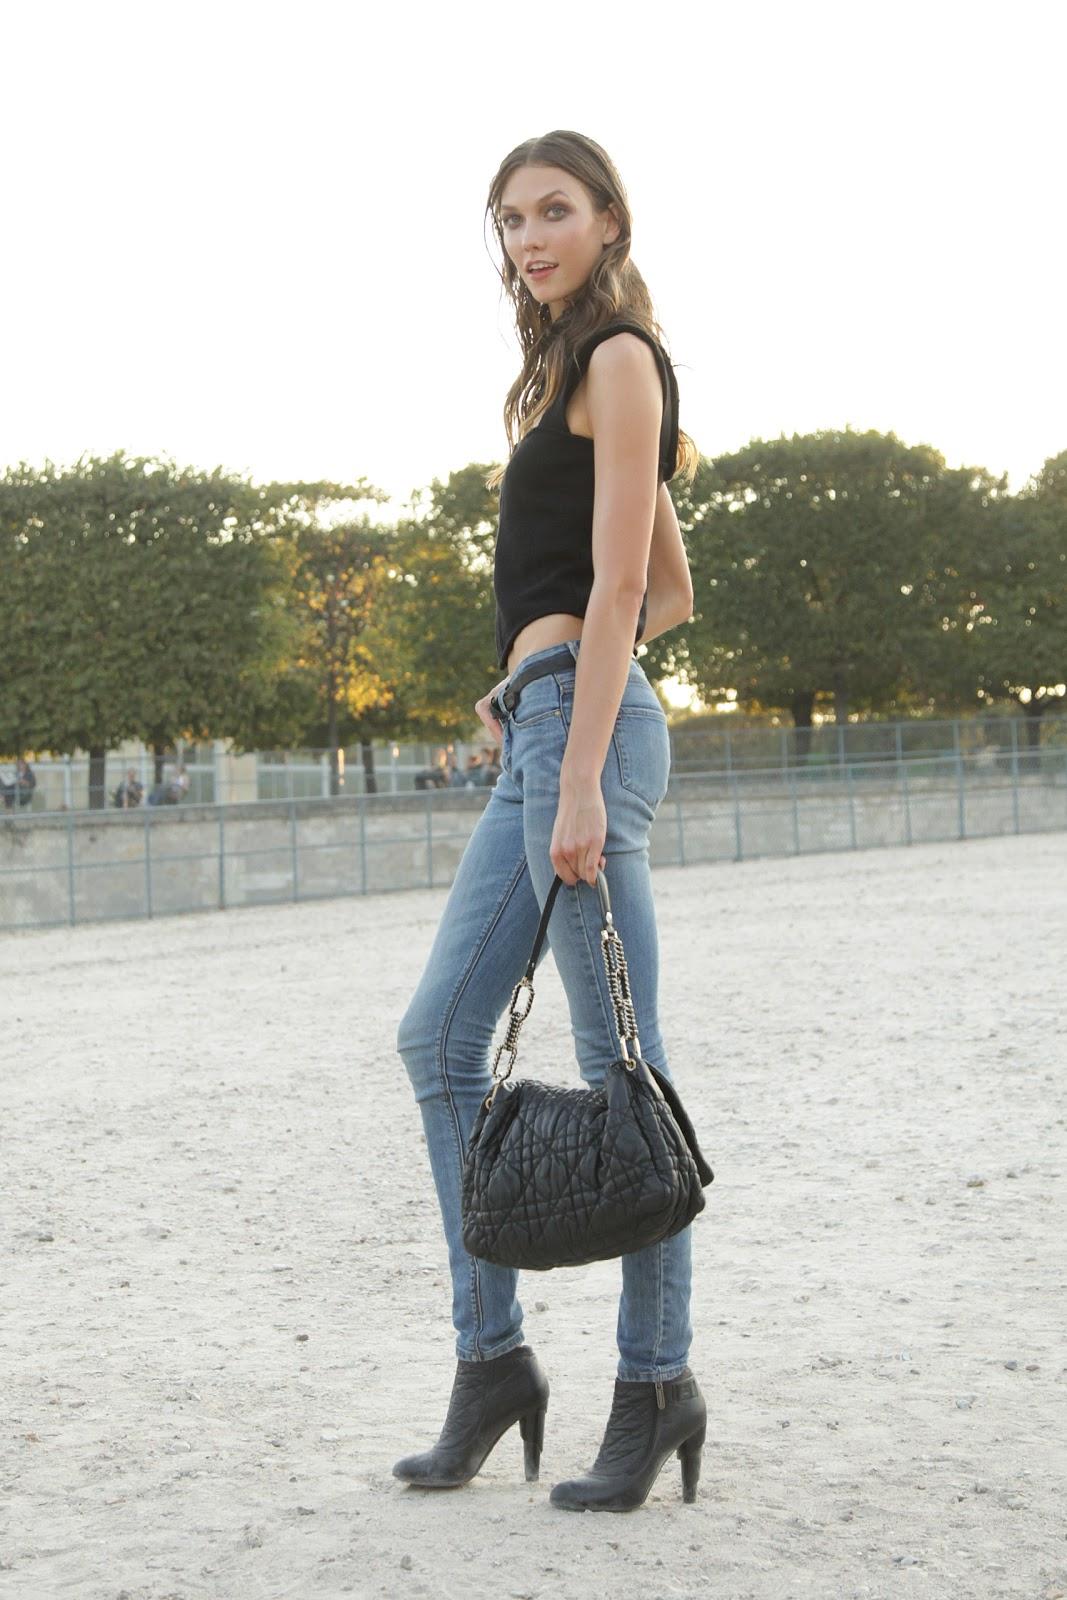 http://4.bp.blogspot.com/-PFJXkKNVOlE/Tpx1u7AylKI/AAAAAAAALv8/9nkN73wW3S0/s1600/Paris-Fashion-Week-Street-Style.jpg